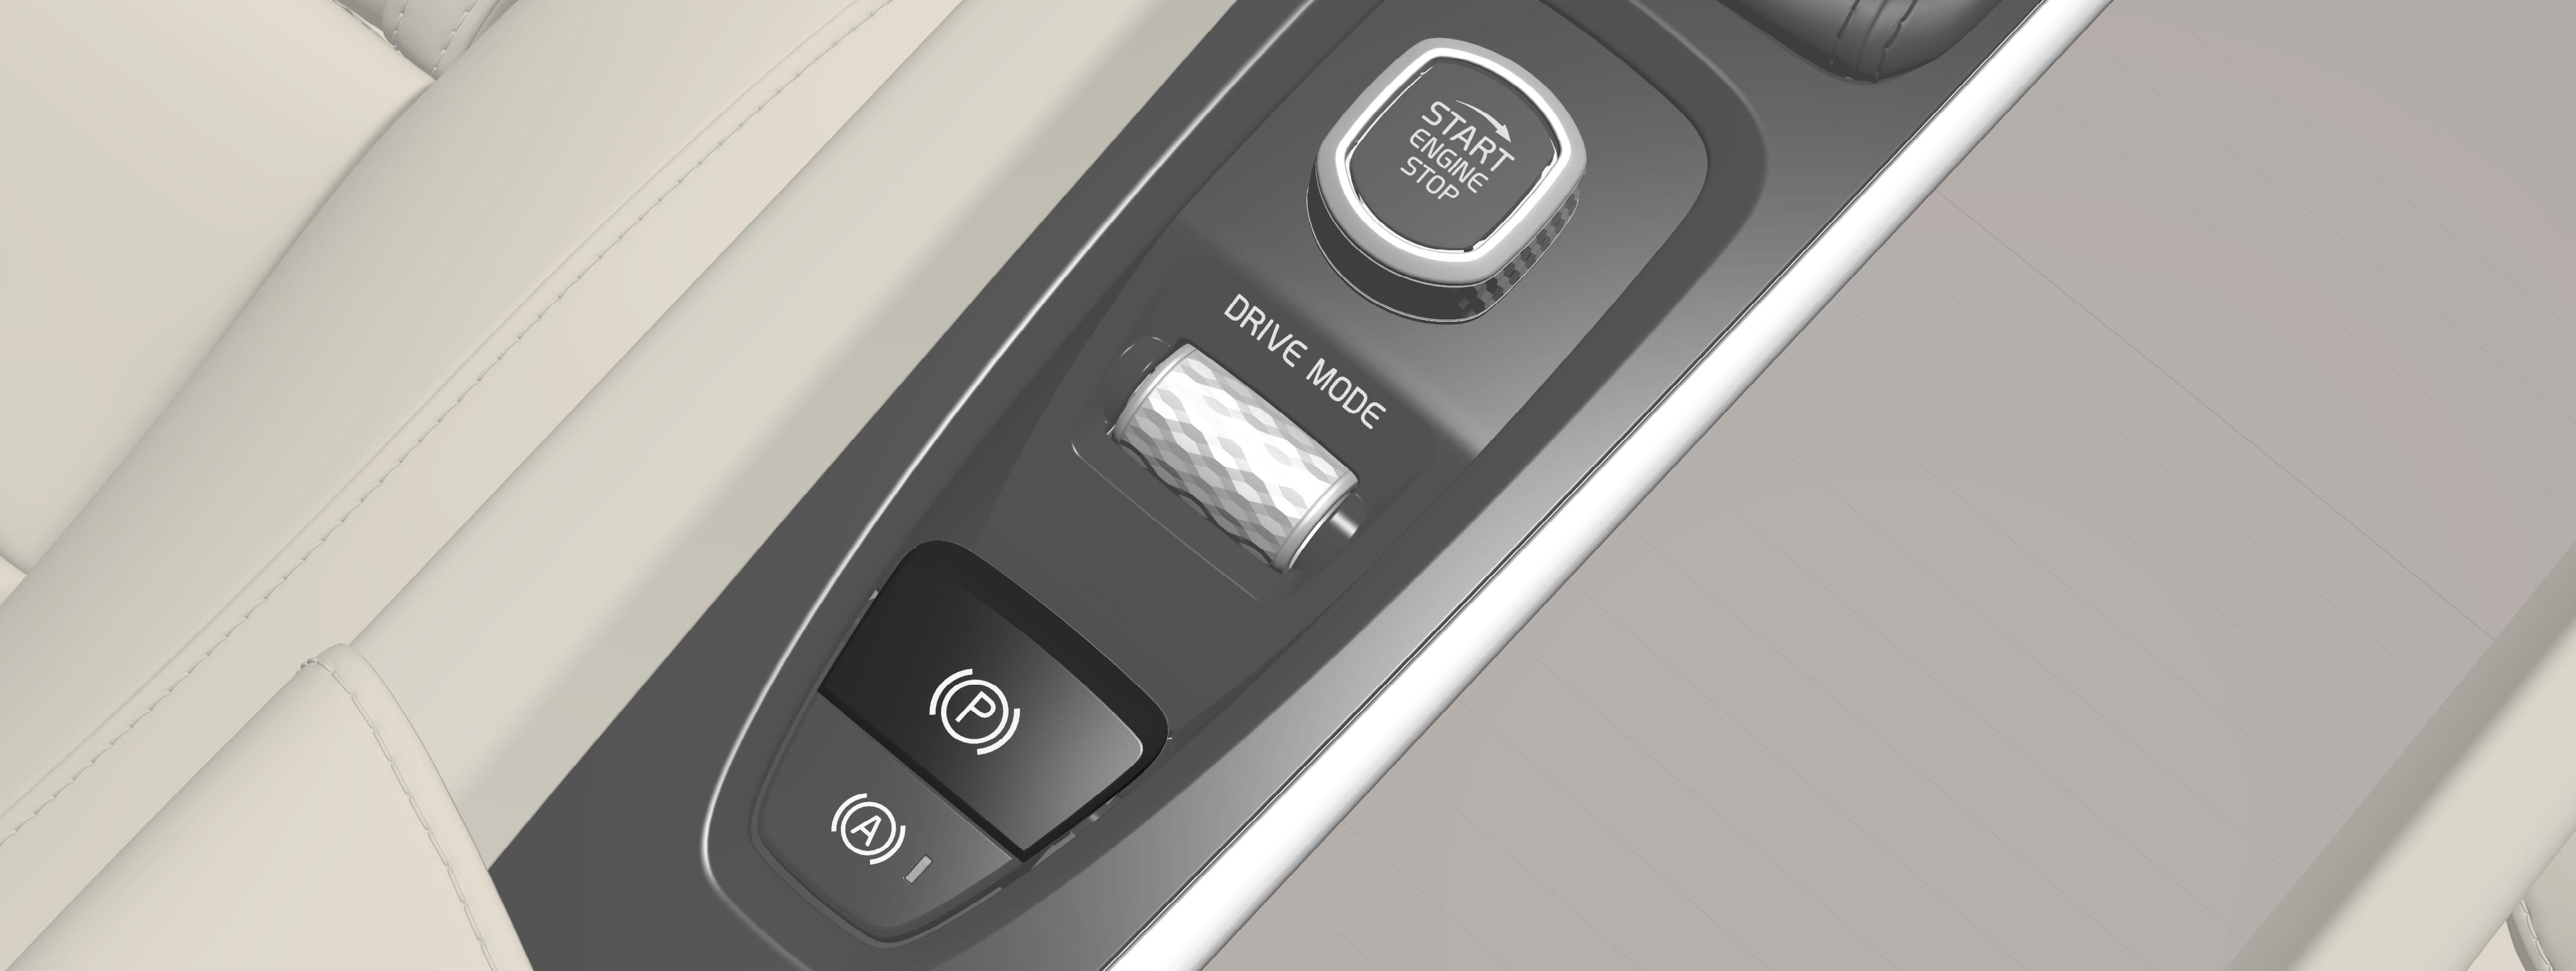 P5-1717-ALL-Parking brake button